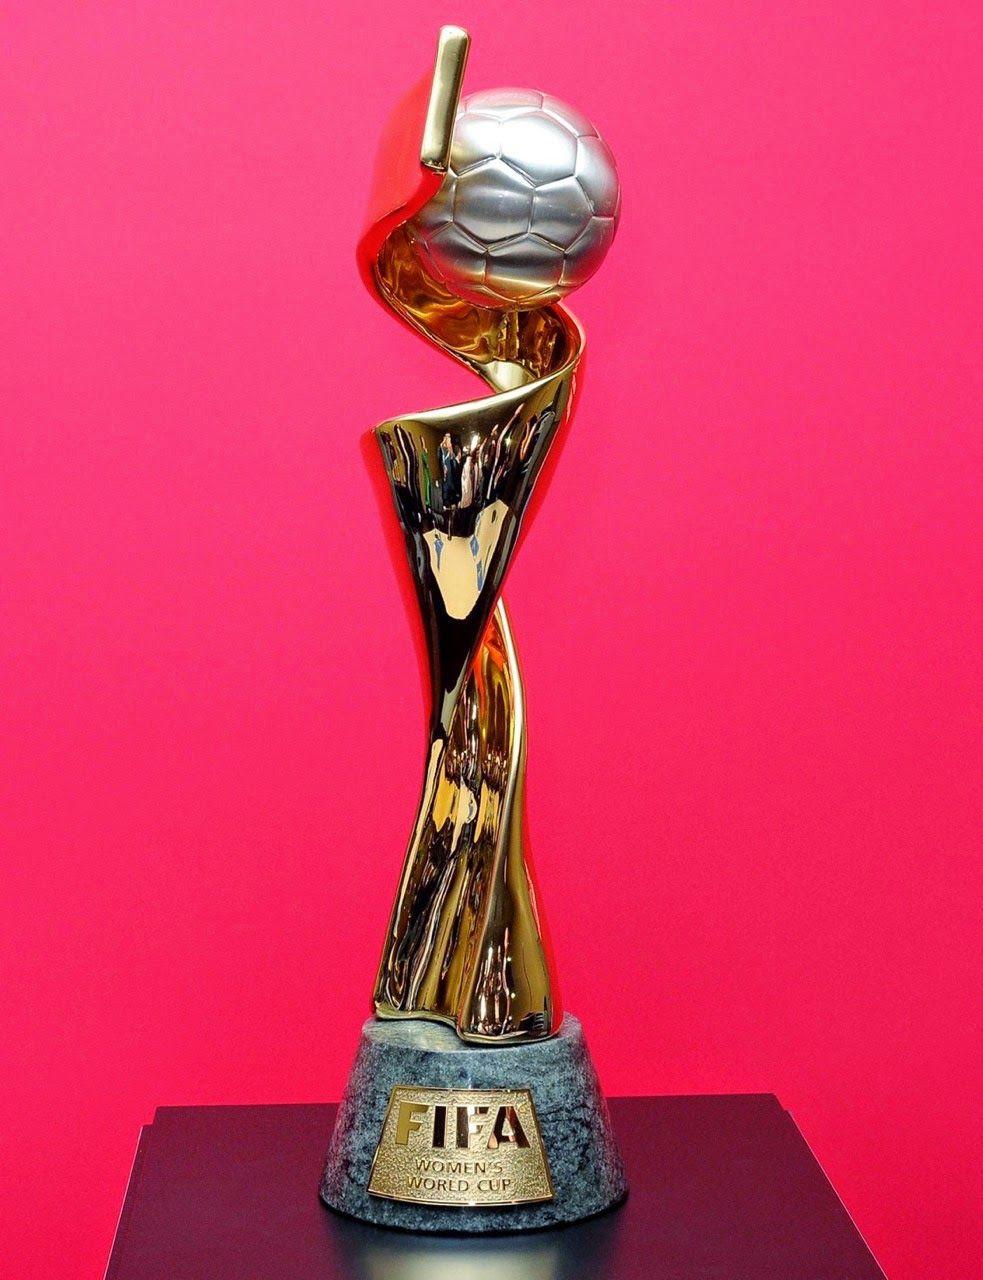 Le troph e de la coupe du monde f minin fifa women 39 s - Coupe du monde de football feminin ...